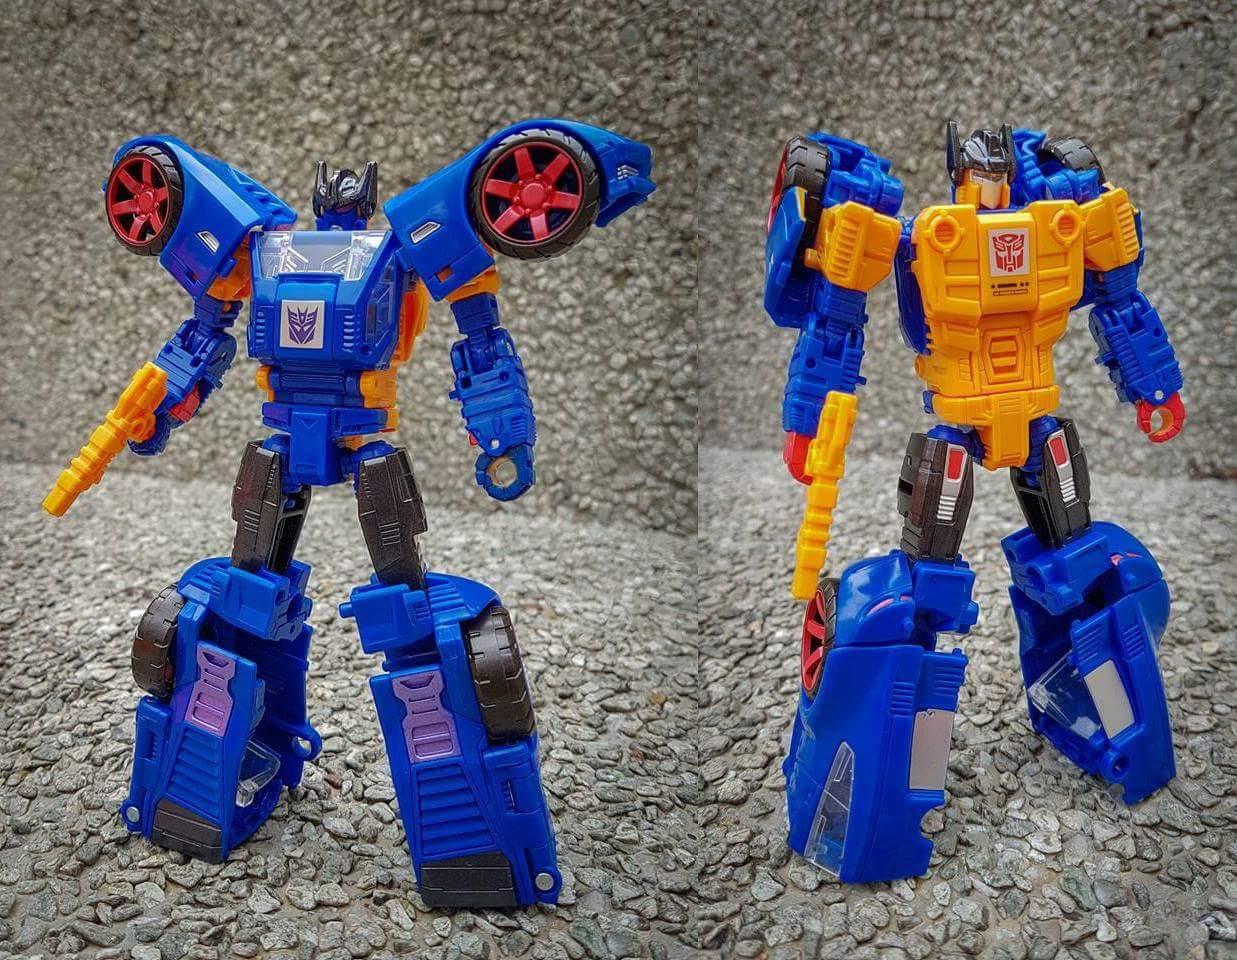 Transformers Generations Premier wars trilogy Punch-Counterpunch exclusive en main